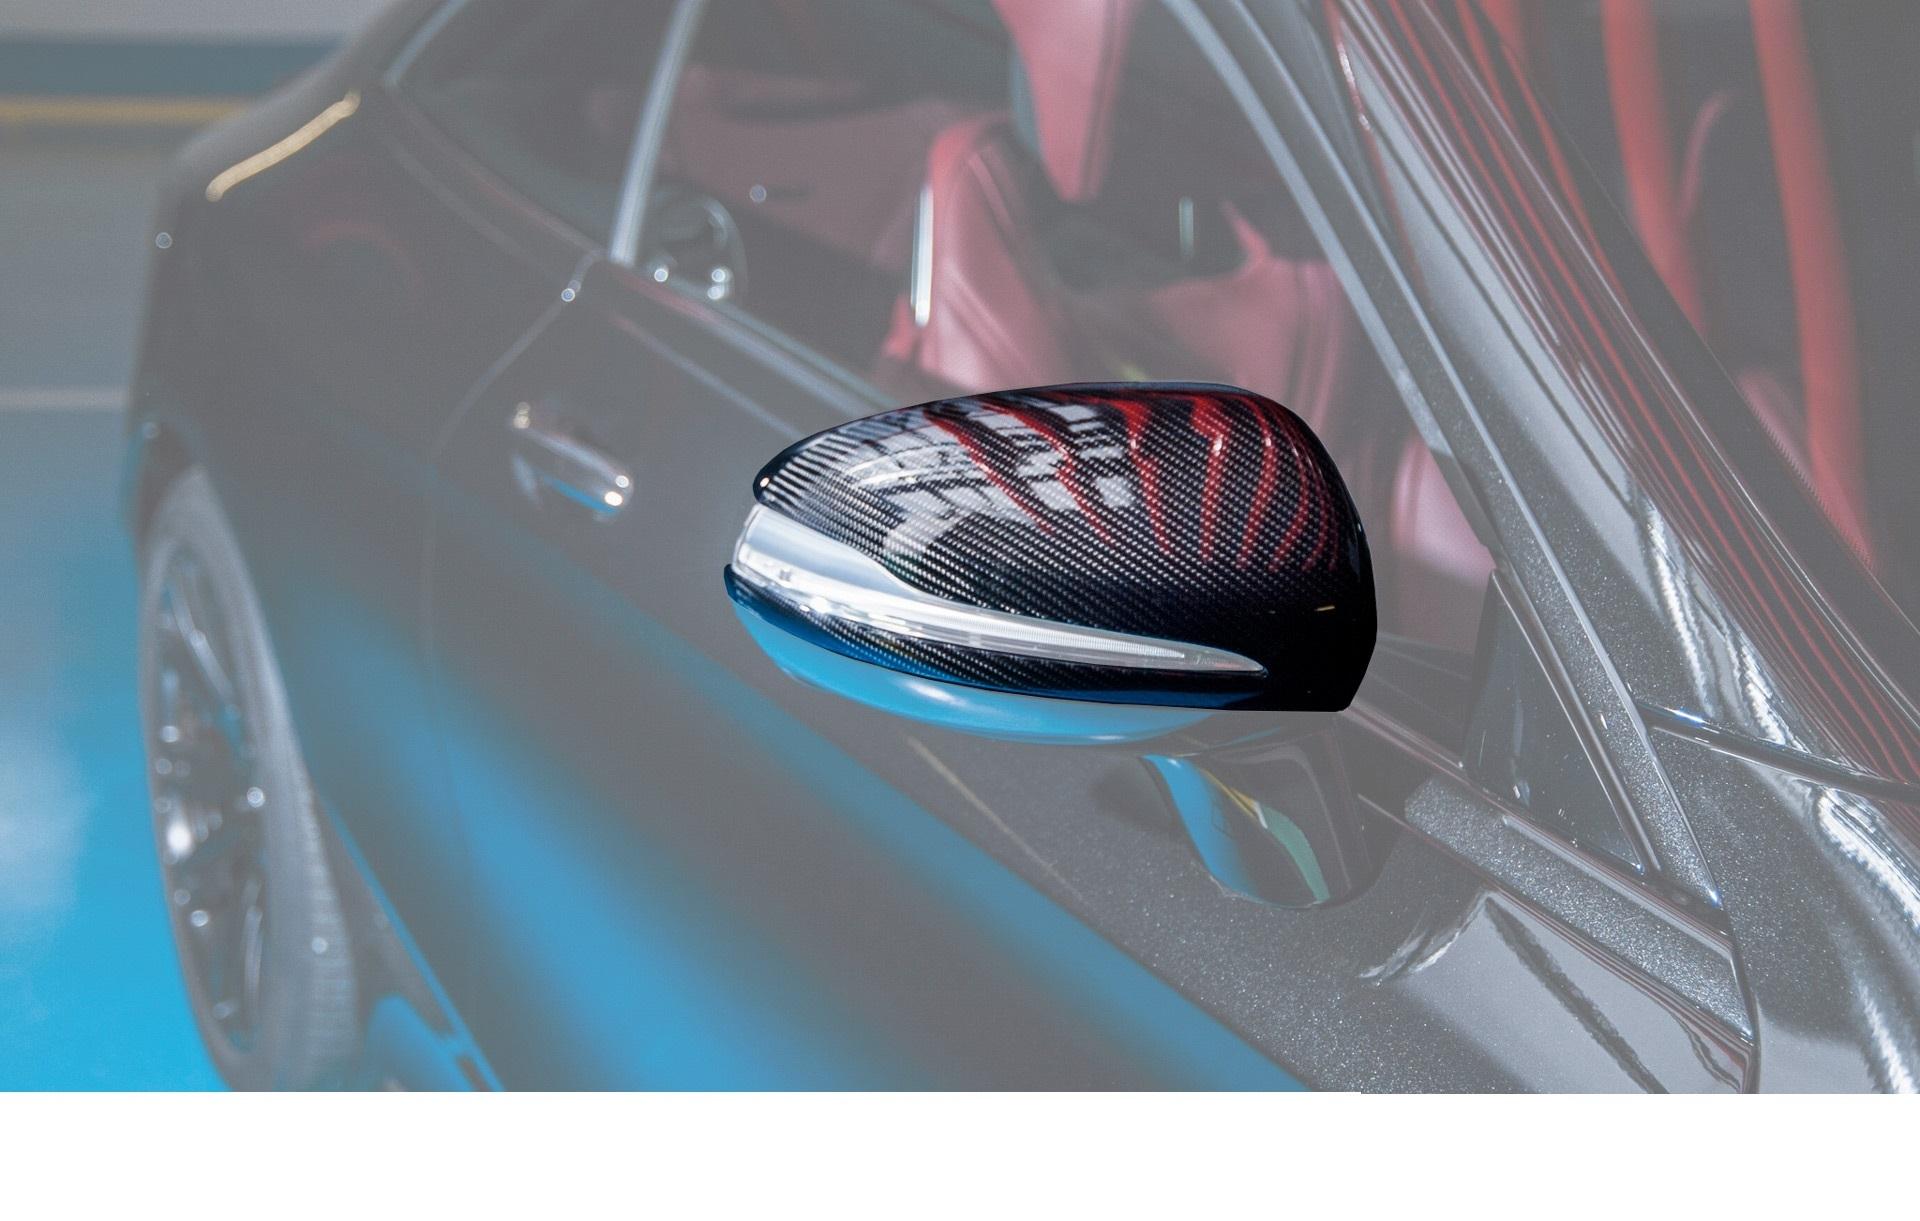 Корпуса зеркал S coupe c217